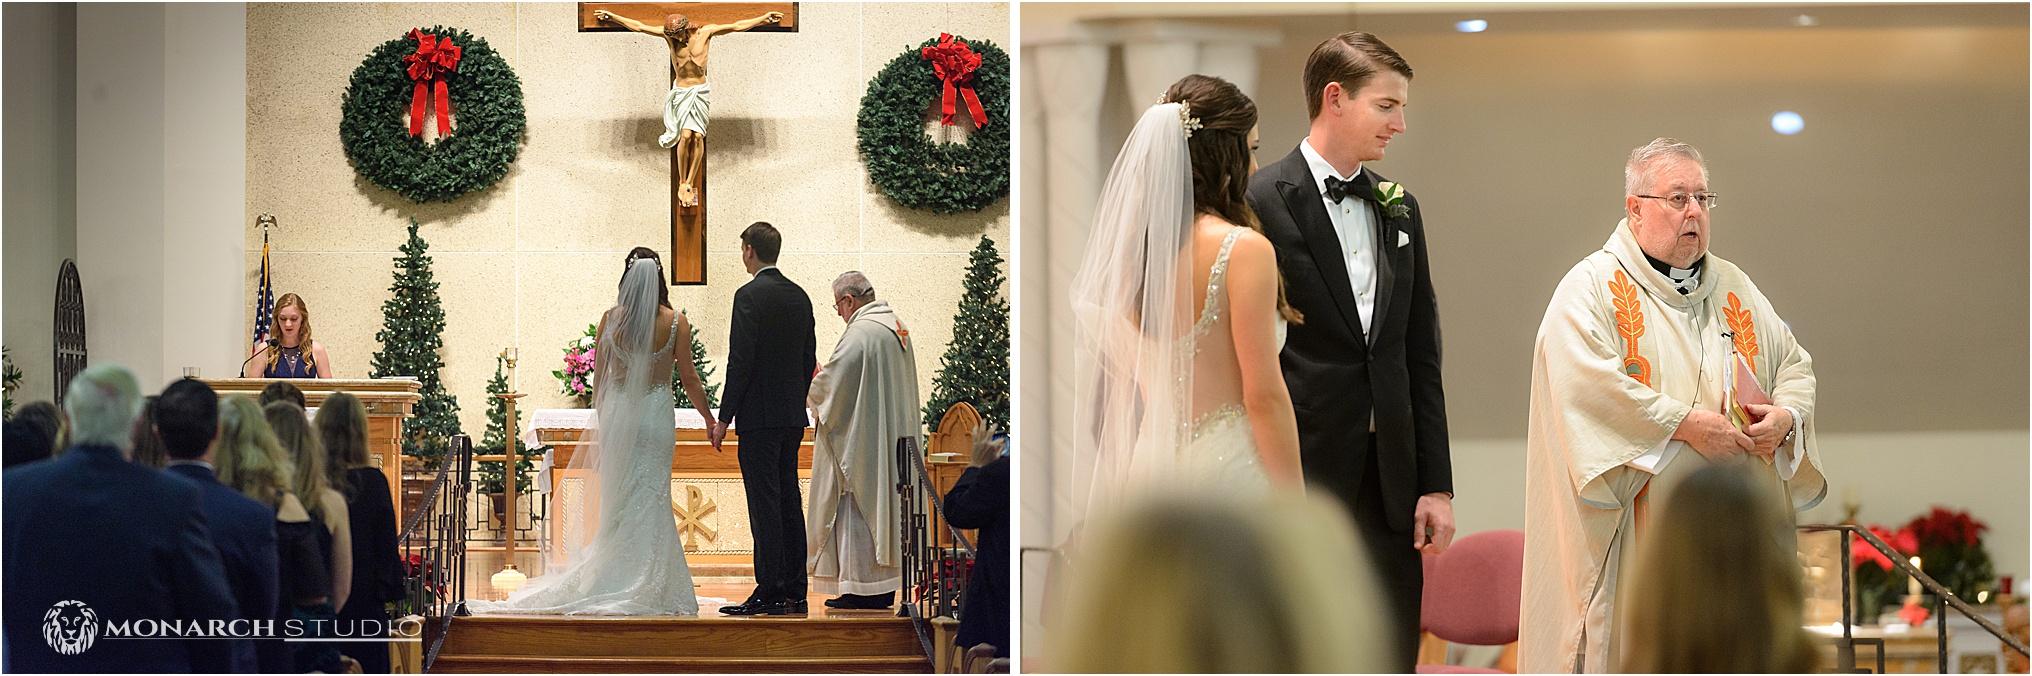 saint-augustine-wedding-photographer-treasury-043.jpg